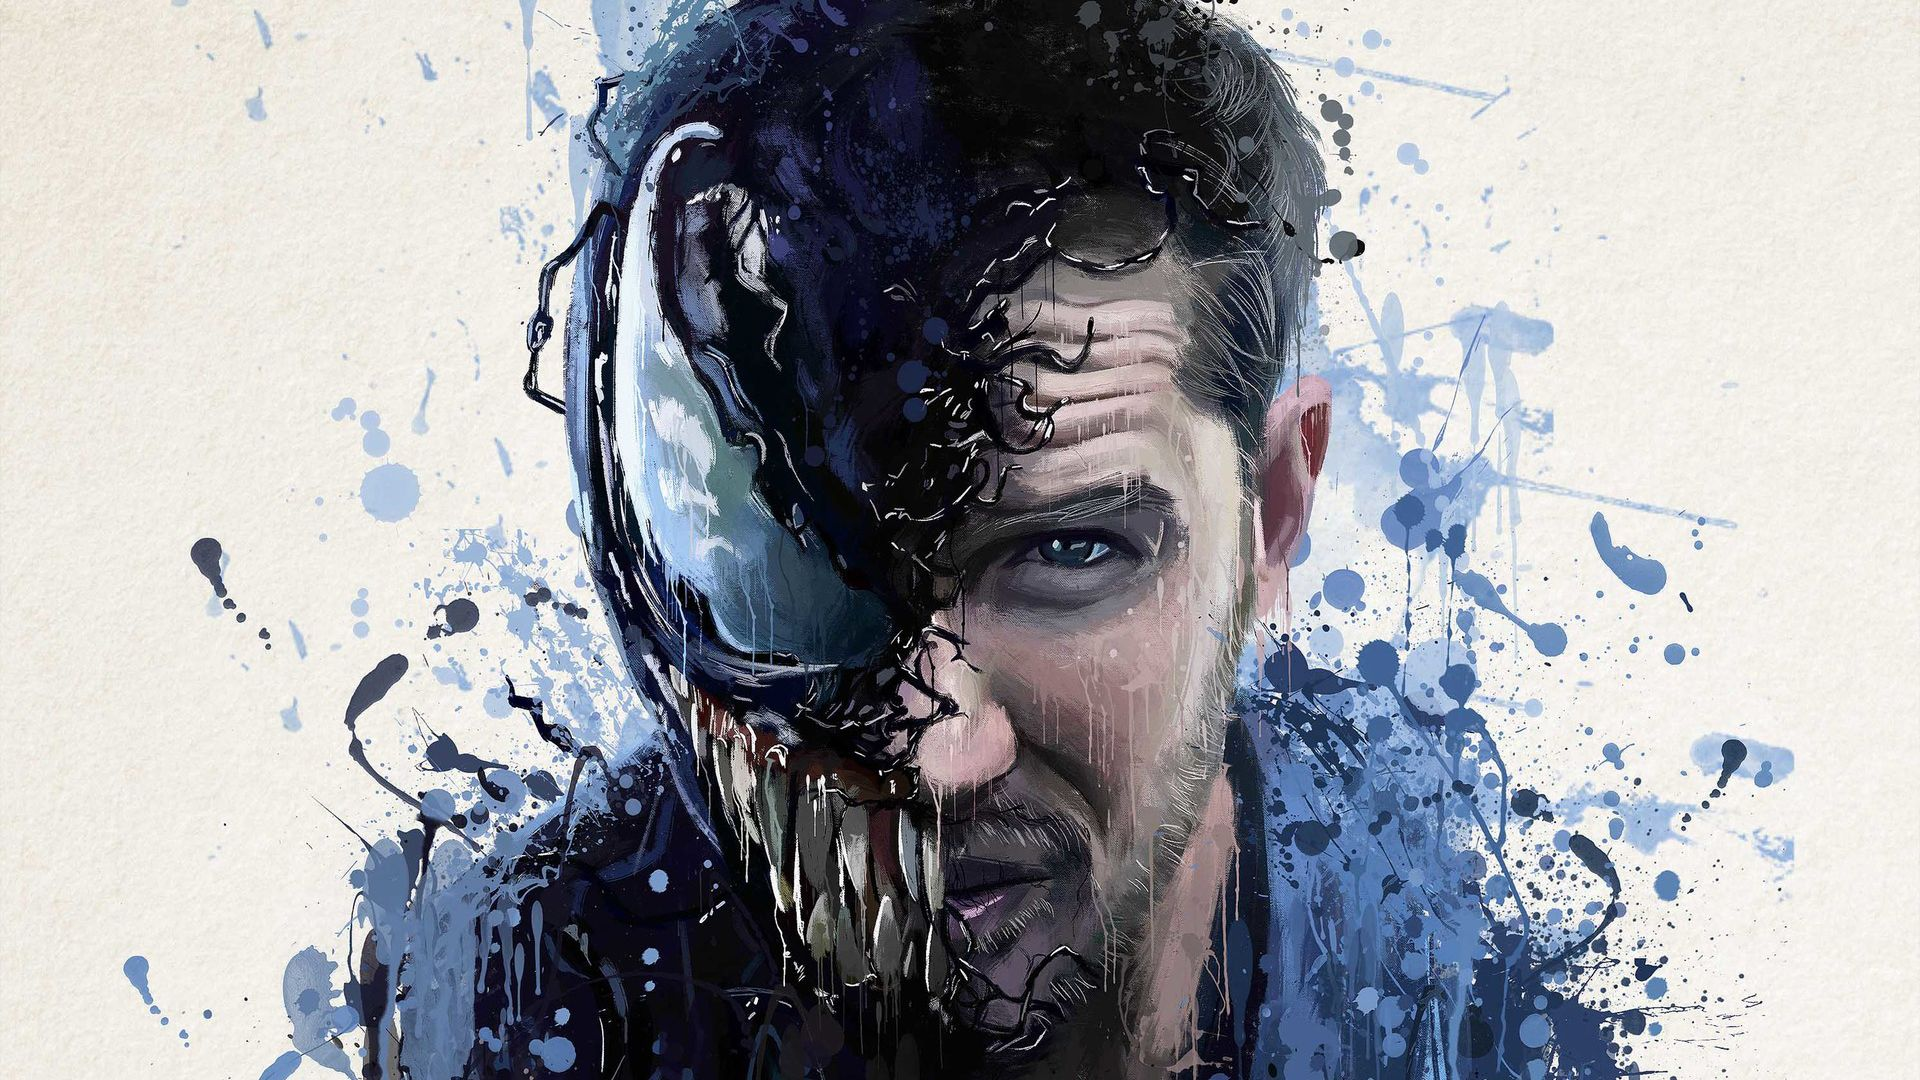 Venom Artwork Artwork Venom Art Actor Picture